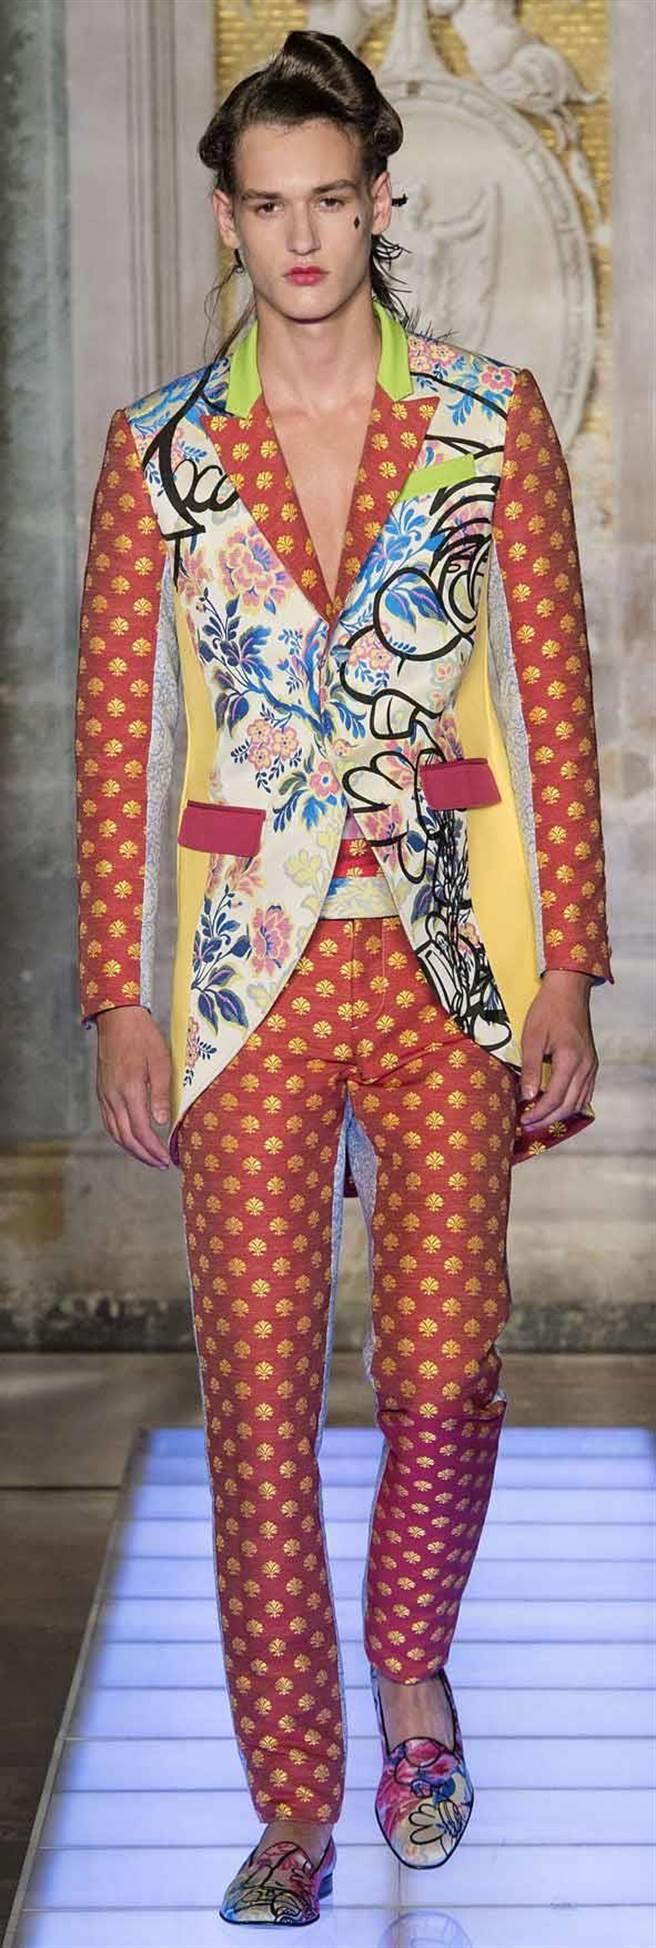 JEREMY SCOTT主政的MOSCHINO,大膽無畏地讓錦緞、糖果條紋、卡通圖印、燕尾服、霓虹色系等元素從容並置,共構出當代的服裝輪廓。圖片提供/JIMMY CHOO